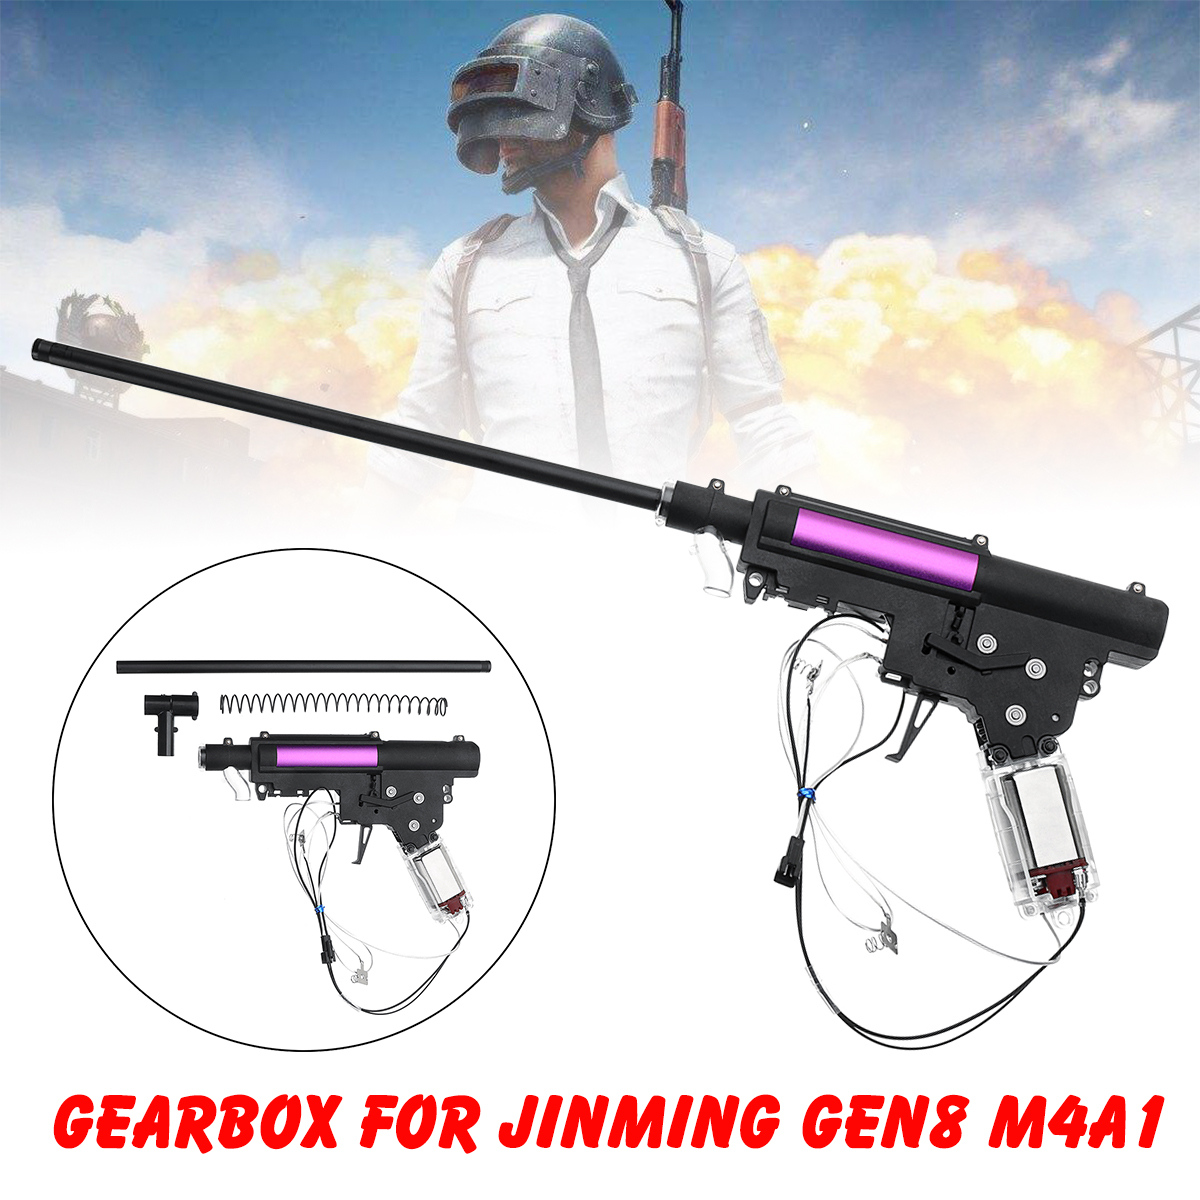 Atualizar caixa de Engrenagens de Nylon Acessórios Para JinMing Gen8 M4 M4A1 Gel Bola Brinquedo Chirldren Brinquedo DIY